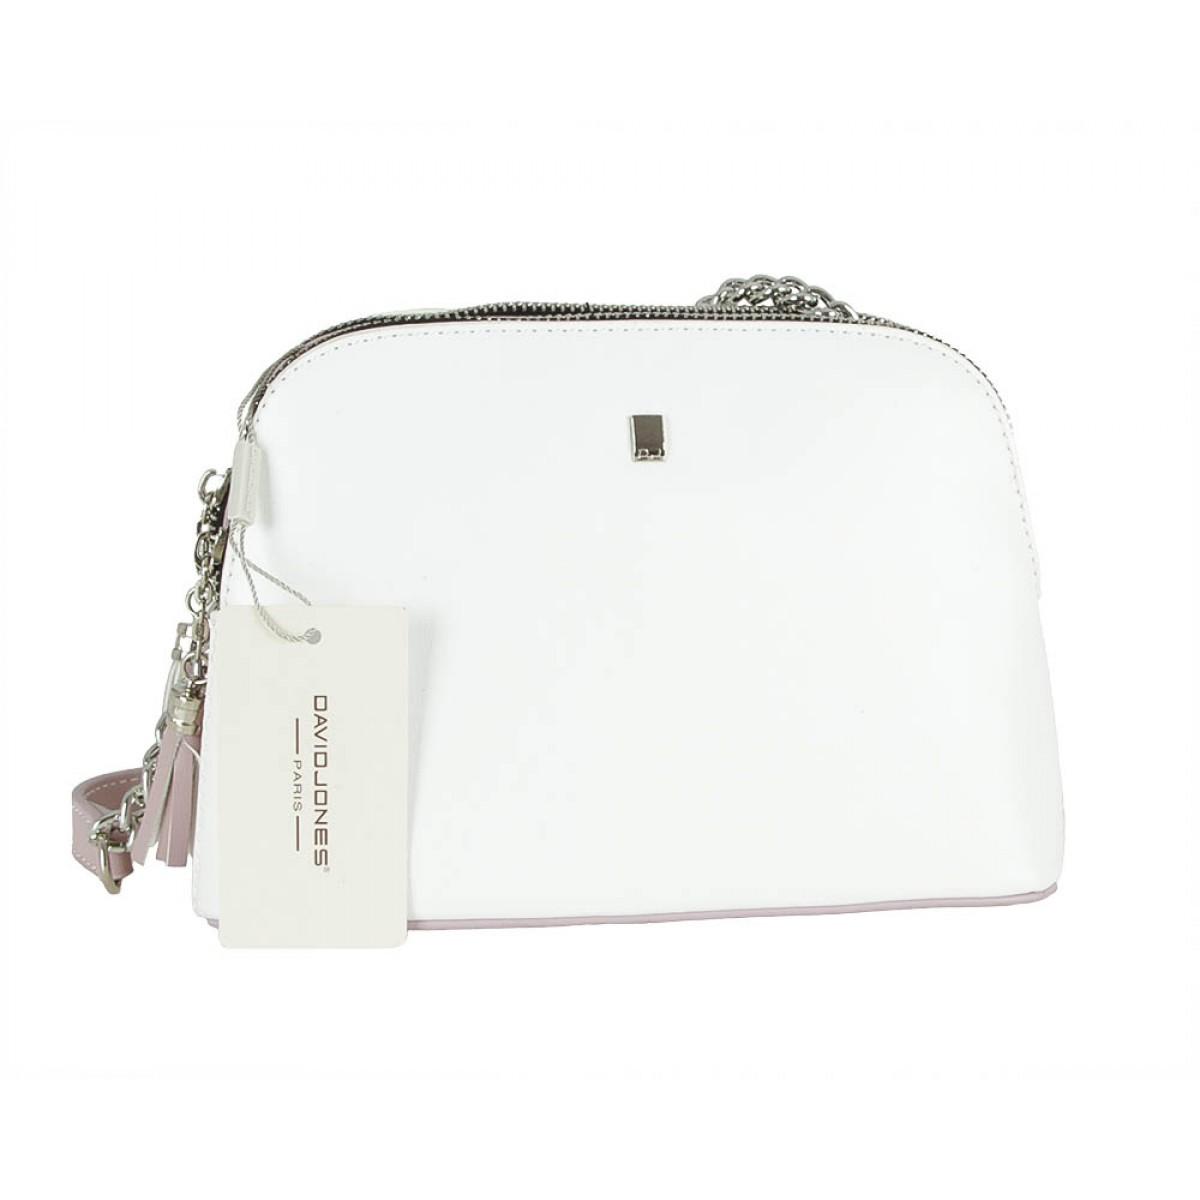 Жіноча сумка David Jones 5907-2 WHITE/PALE PURPLE